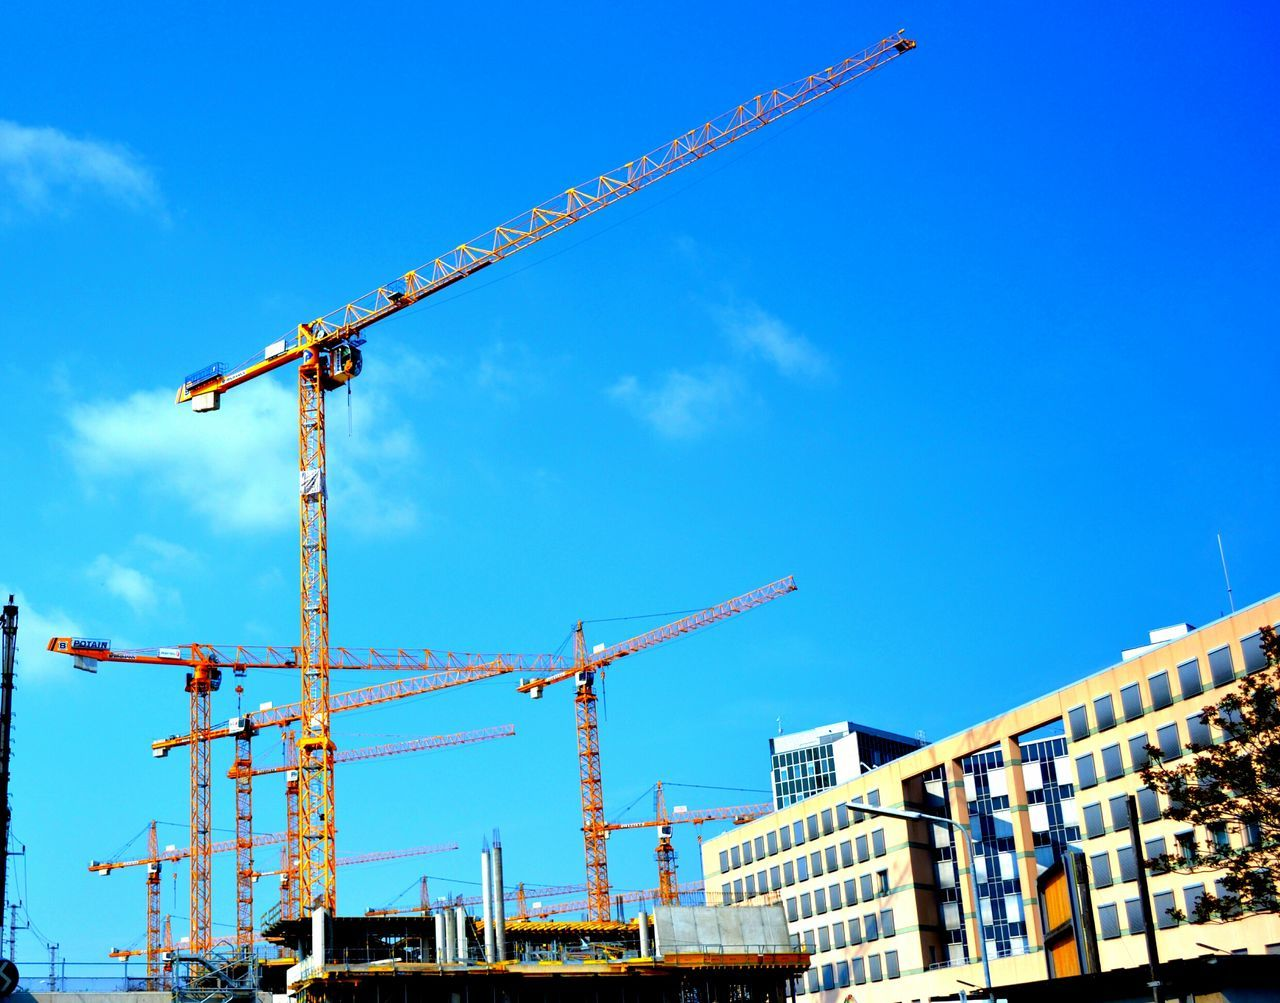 Cranespotting Crane - Construction Machinery Crane Cranes Craneporn Yellow Building Buildings & Sky Built Structure BuildingPorn Cranes And Construction Crane Truck